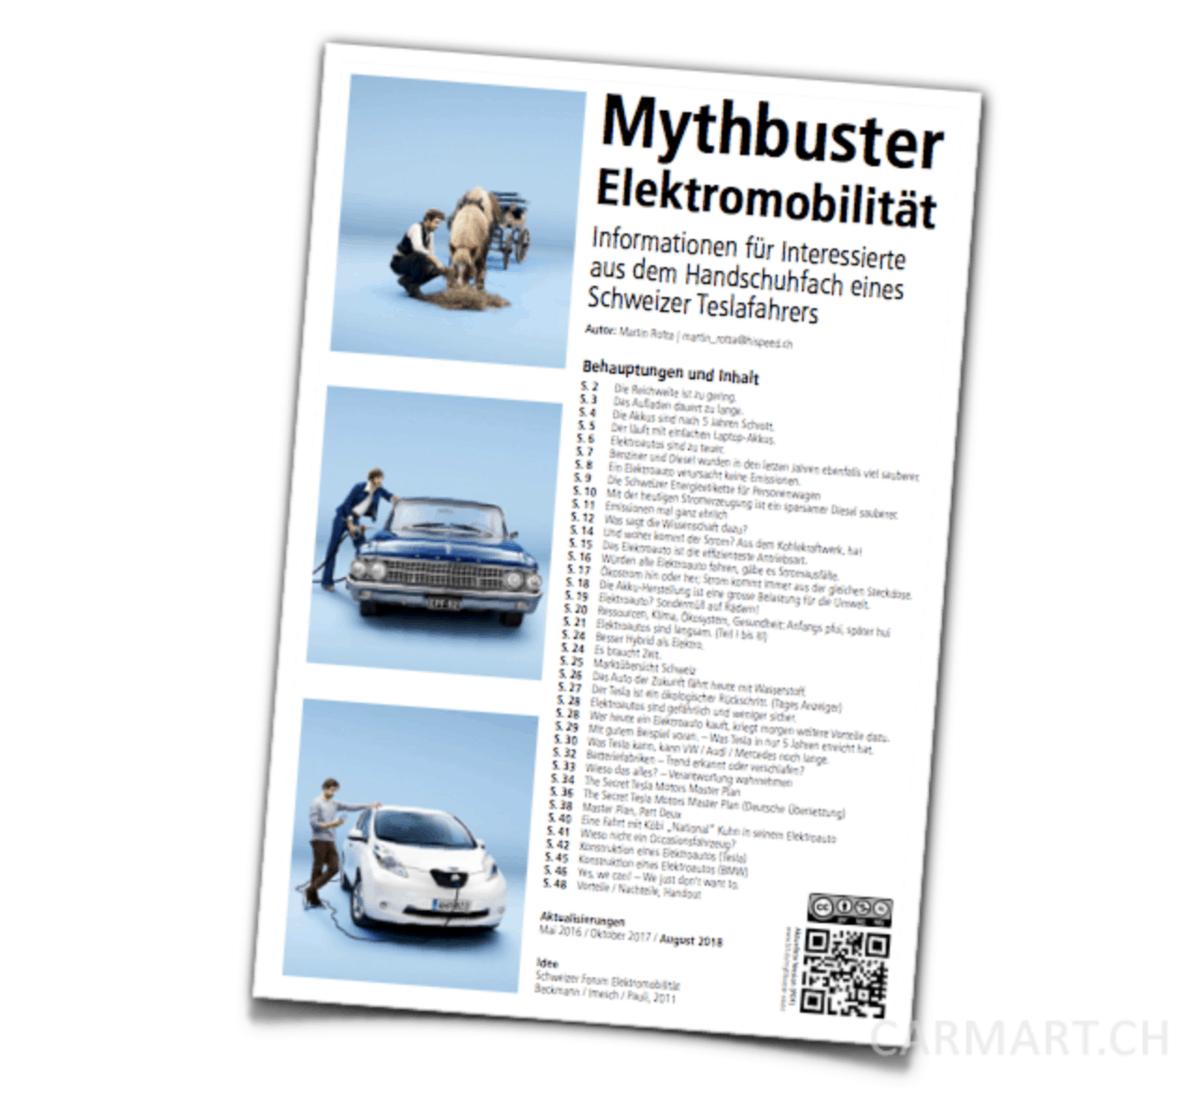 mythbuster.ch